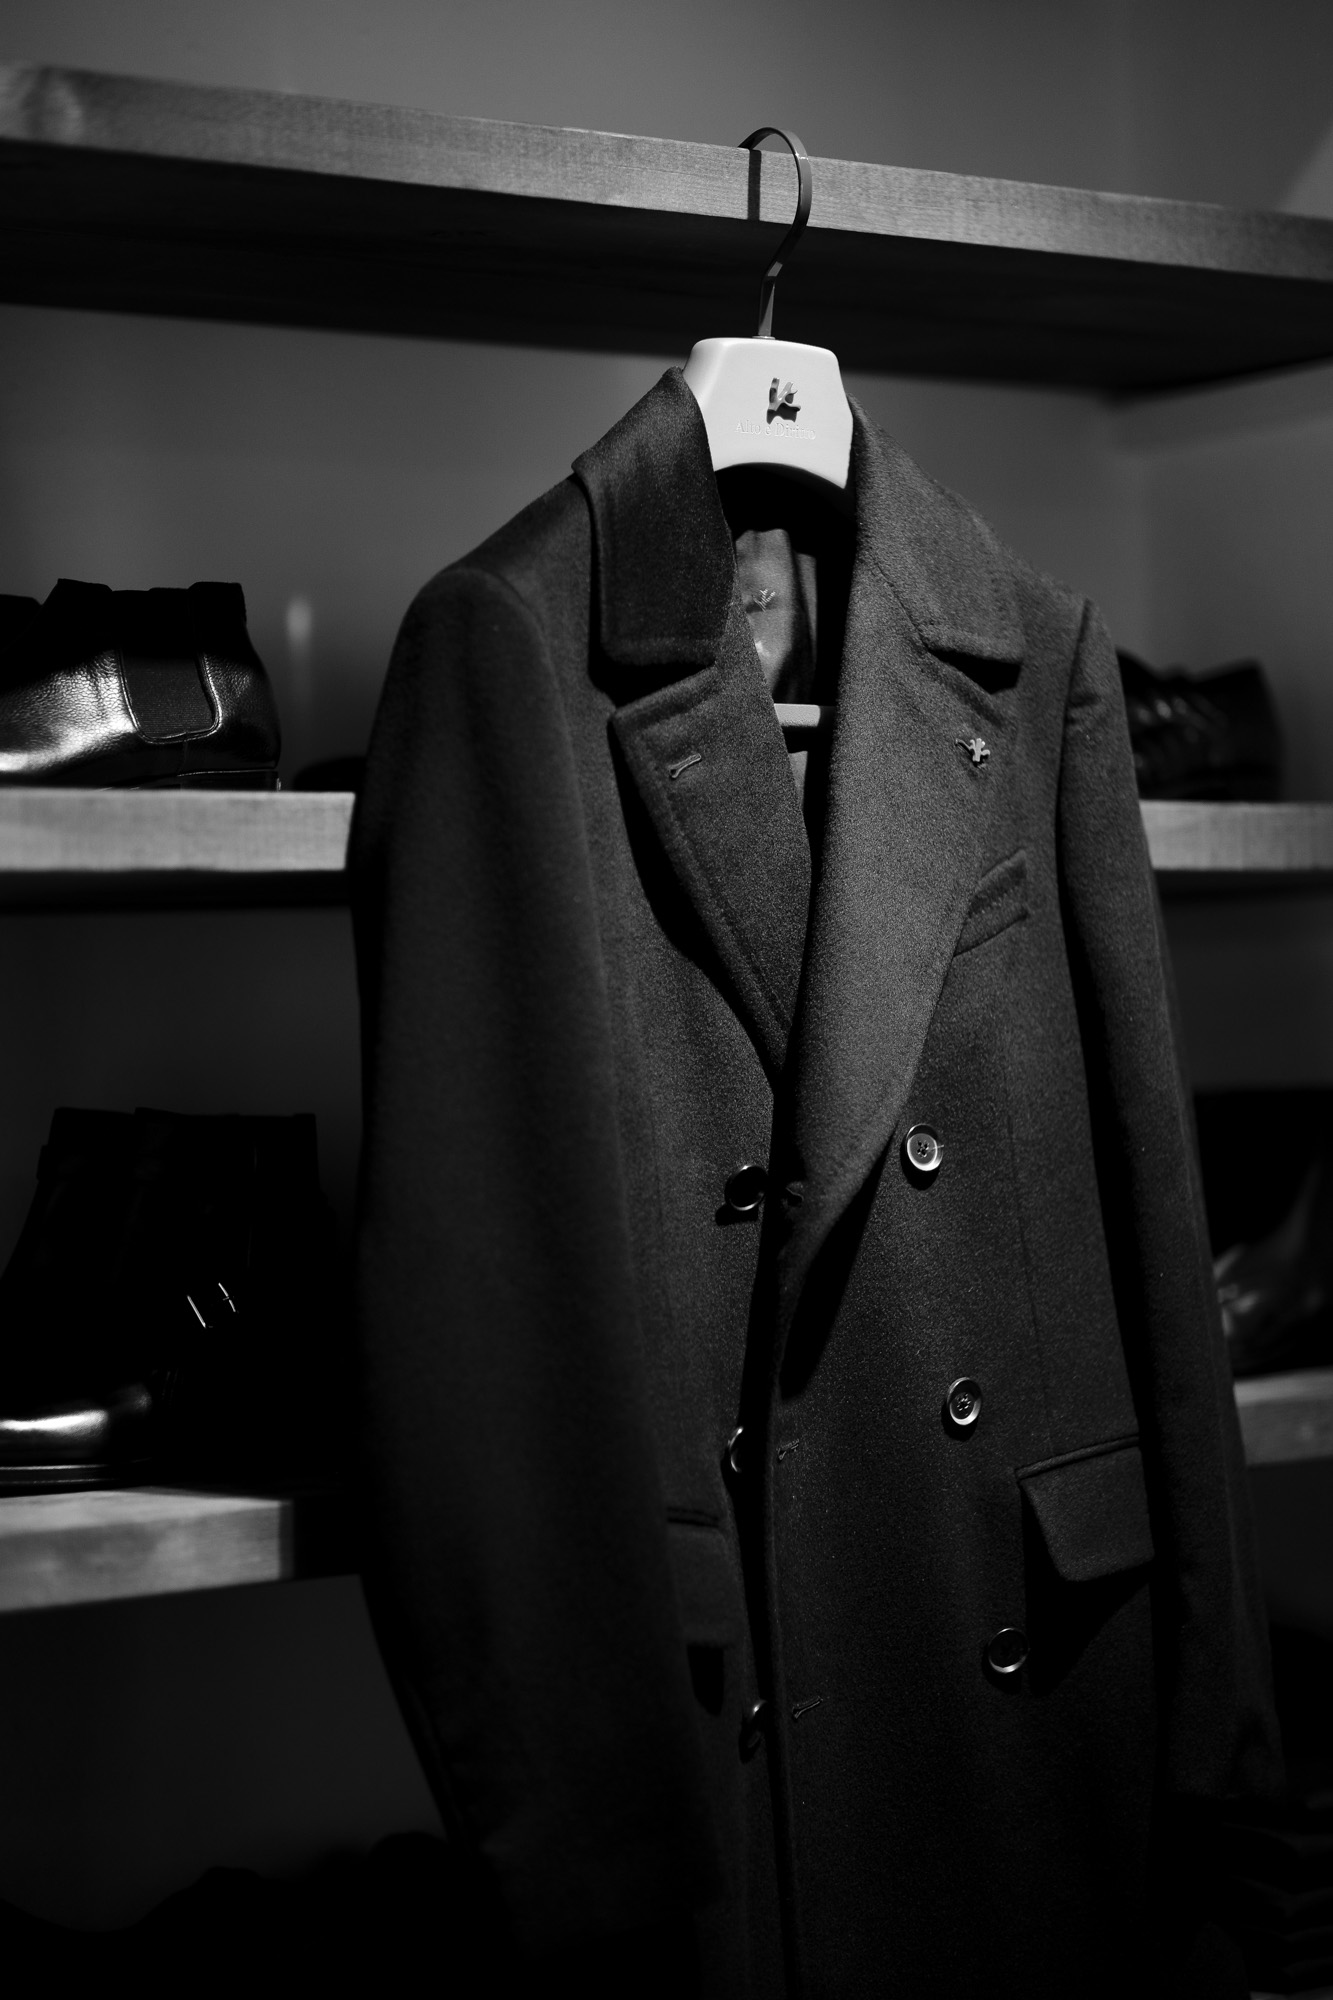 ISAIA Cashmere Single Chester Coat , Double Chester Coat 2021 AW 【Special Model】 イザイア 2021秋冬 カシミヤ 超絶生地 COAT コート シングルコート ダブルコート チェスターコート スペシャルモデル  愛知 名古屋 Alto e Diritto altoediritto アルトエデリット